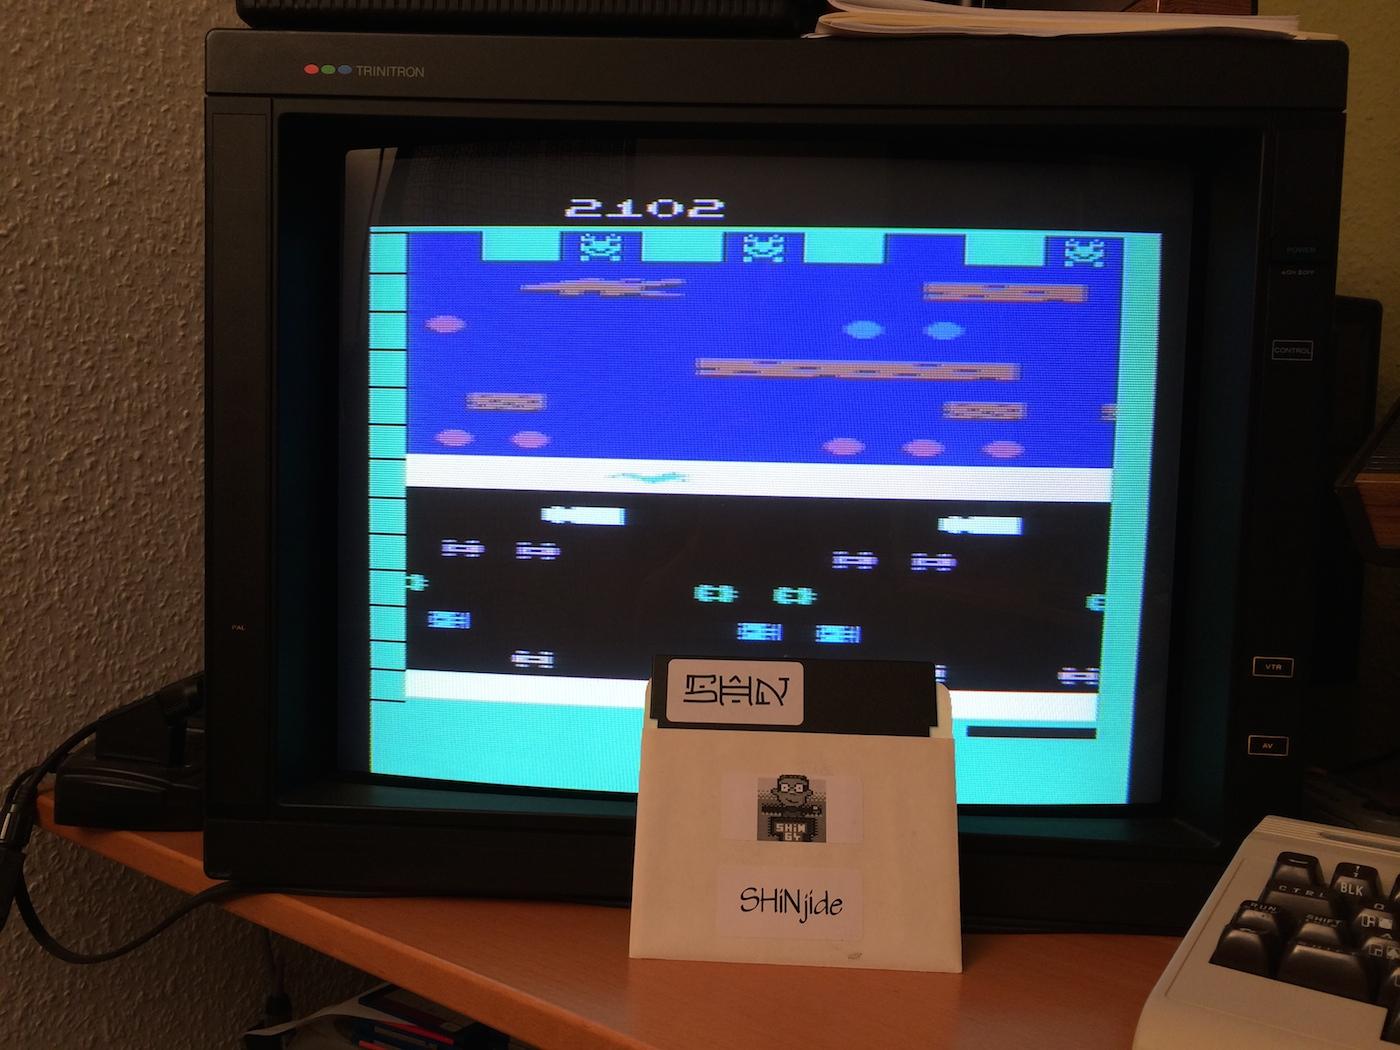 SHiNjide: Frogger (Atari 2600 Expert/A) 2,102 points on 2014-07-09 16:59:31